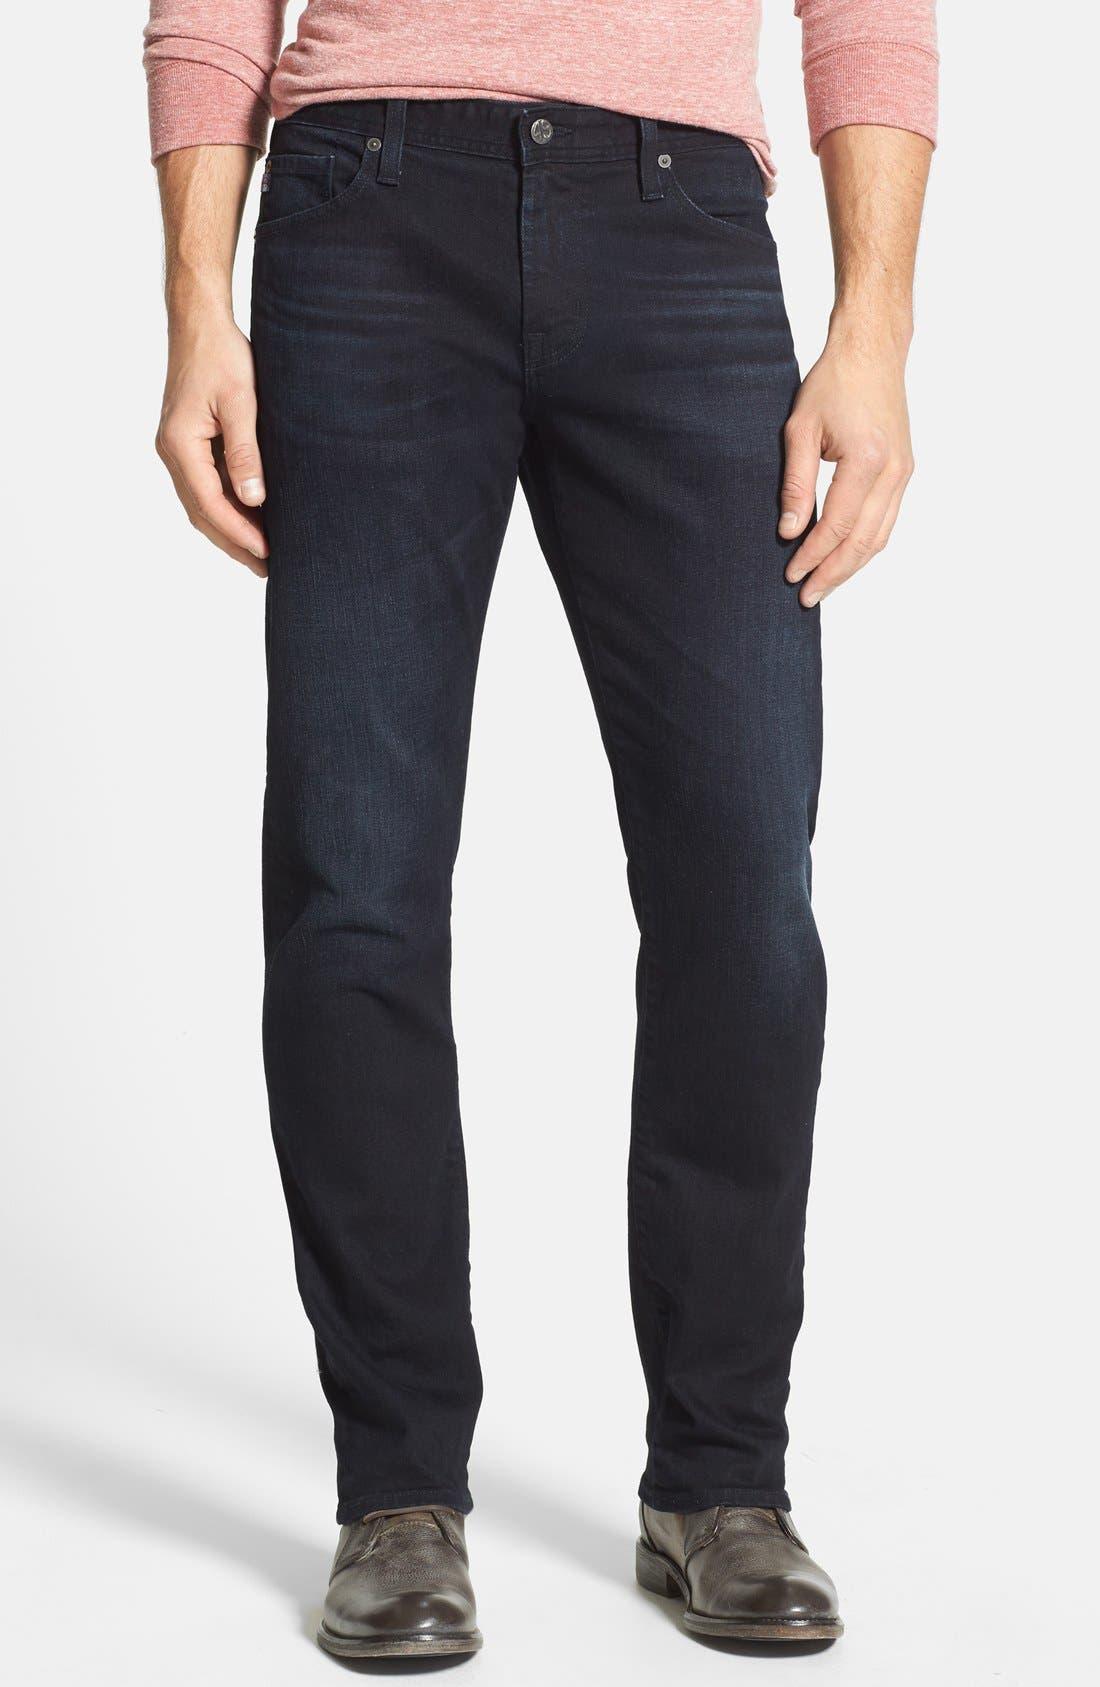 Alternate Image 1 Selected - AG 'Graduate' Tailored Straight Leg Jeans (3 Years Deep Midnight)